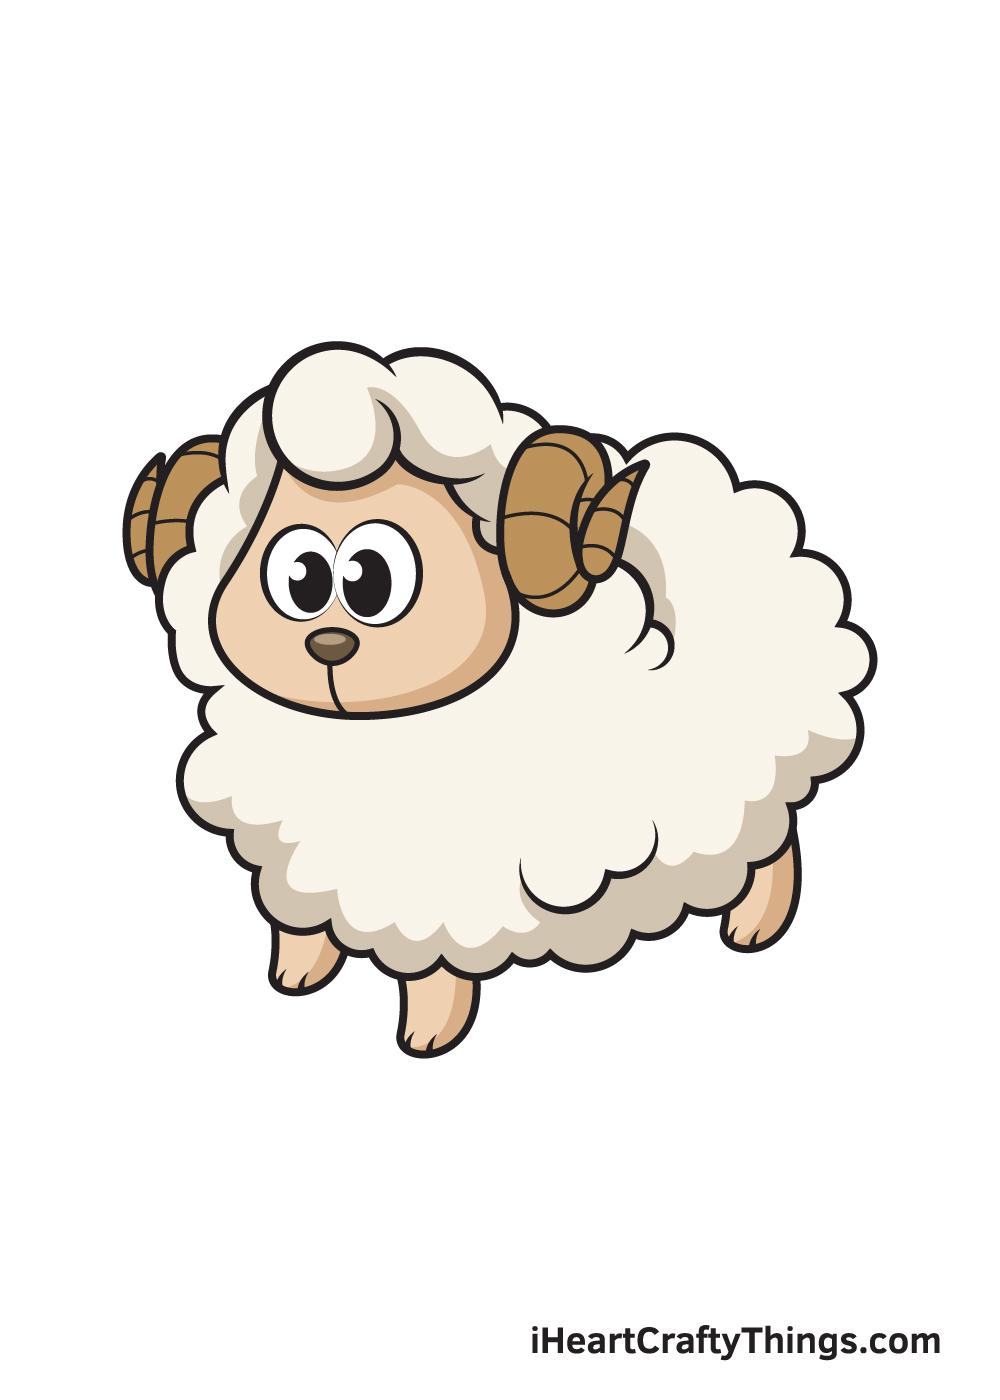 sheep drawing 9 steps